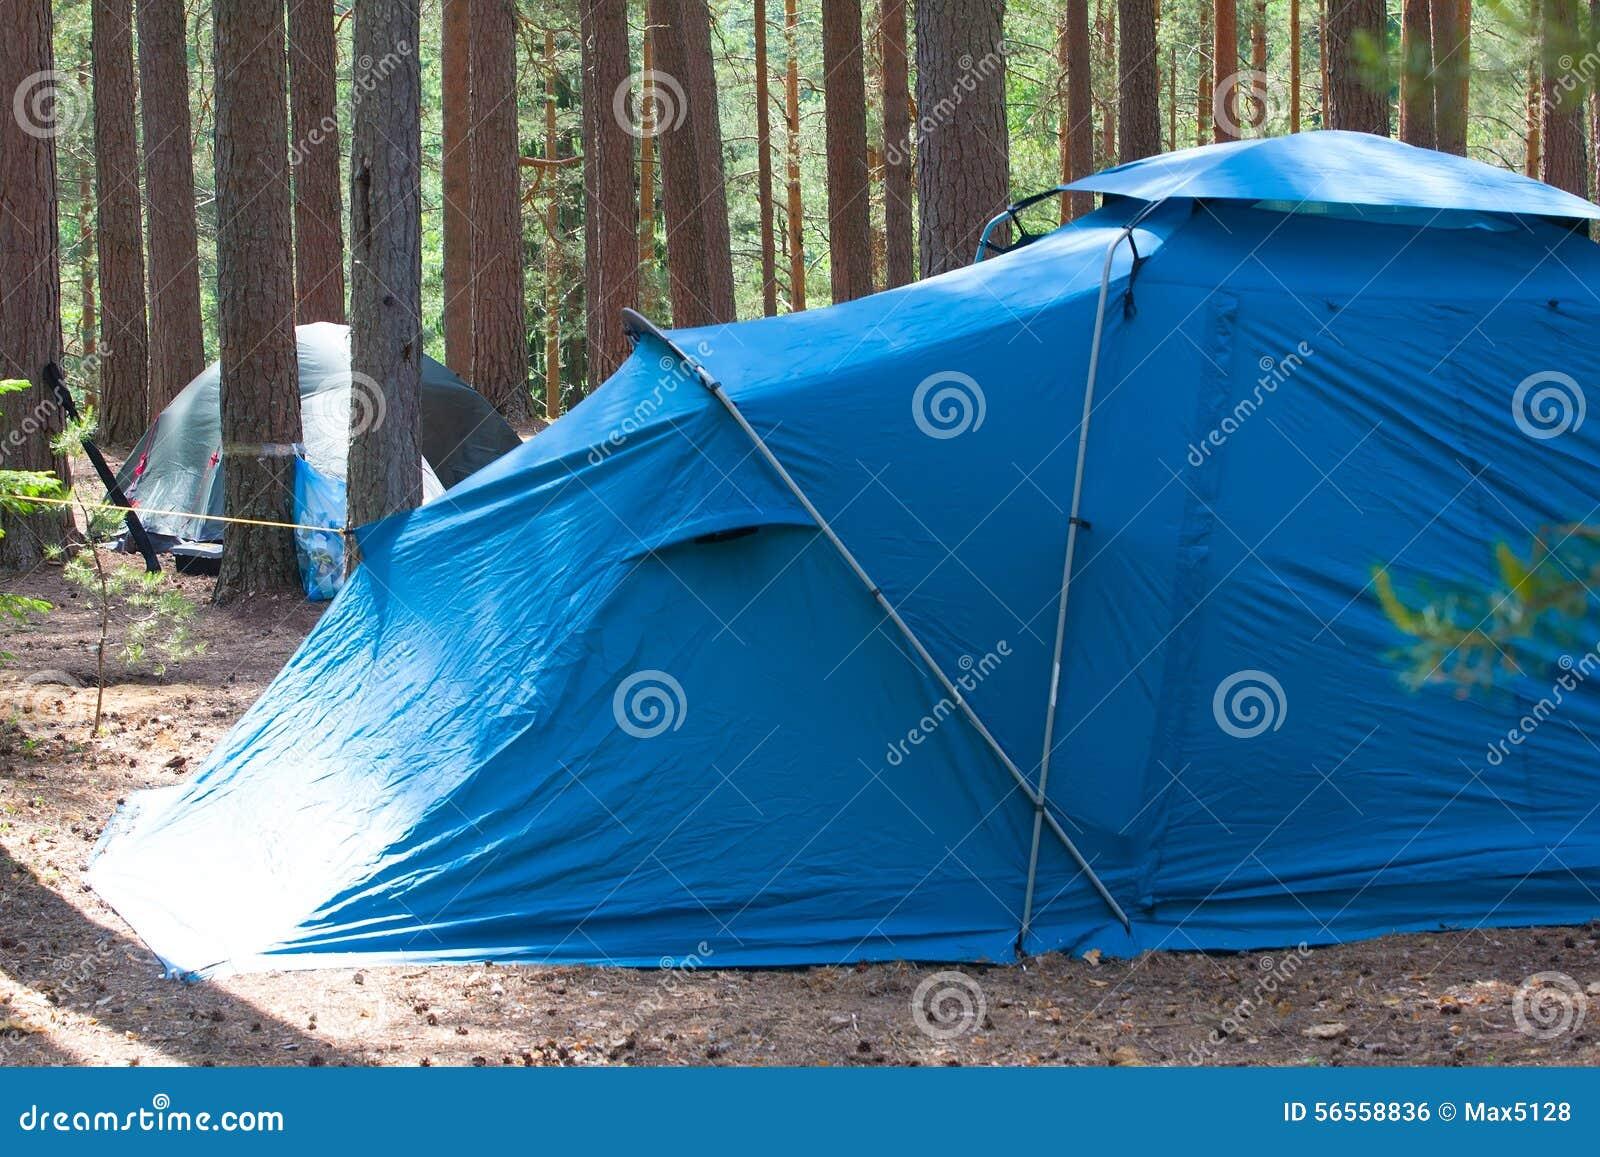 Download Στρατοπέδευση υπαίθρια με τη σκηνή στα ξύλα το καλοκαίρι Στοκ Εικόνες - εικόνα από φύση, αναψυχή: 56558836